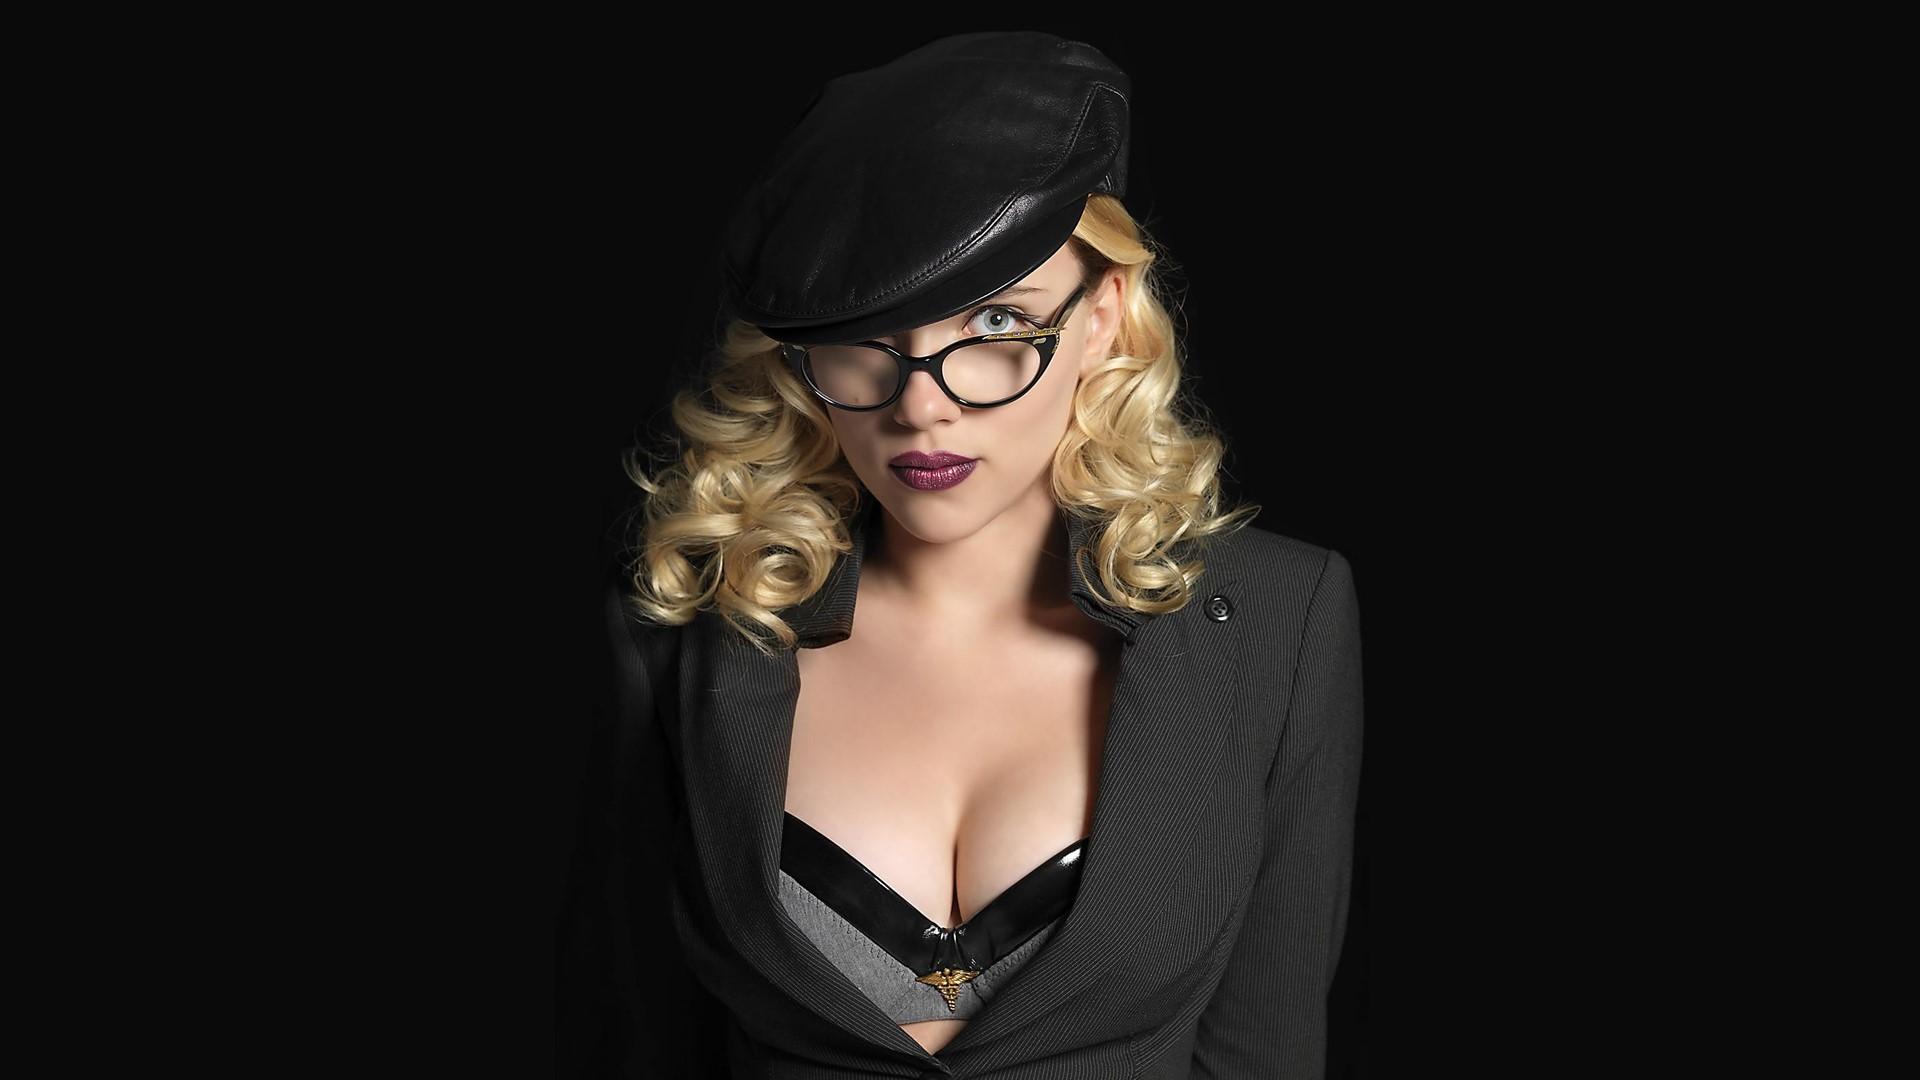 Scarlett Johansson Background images